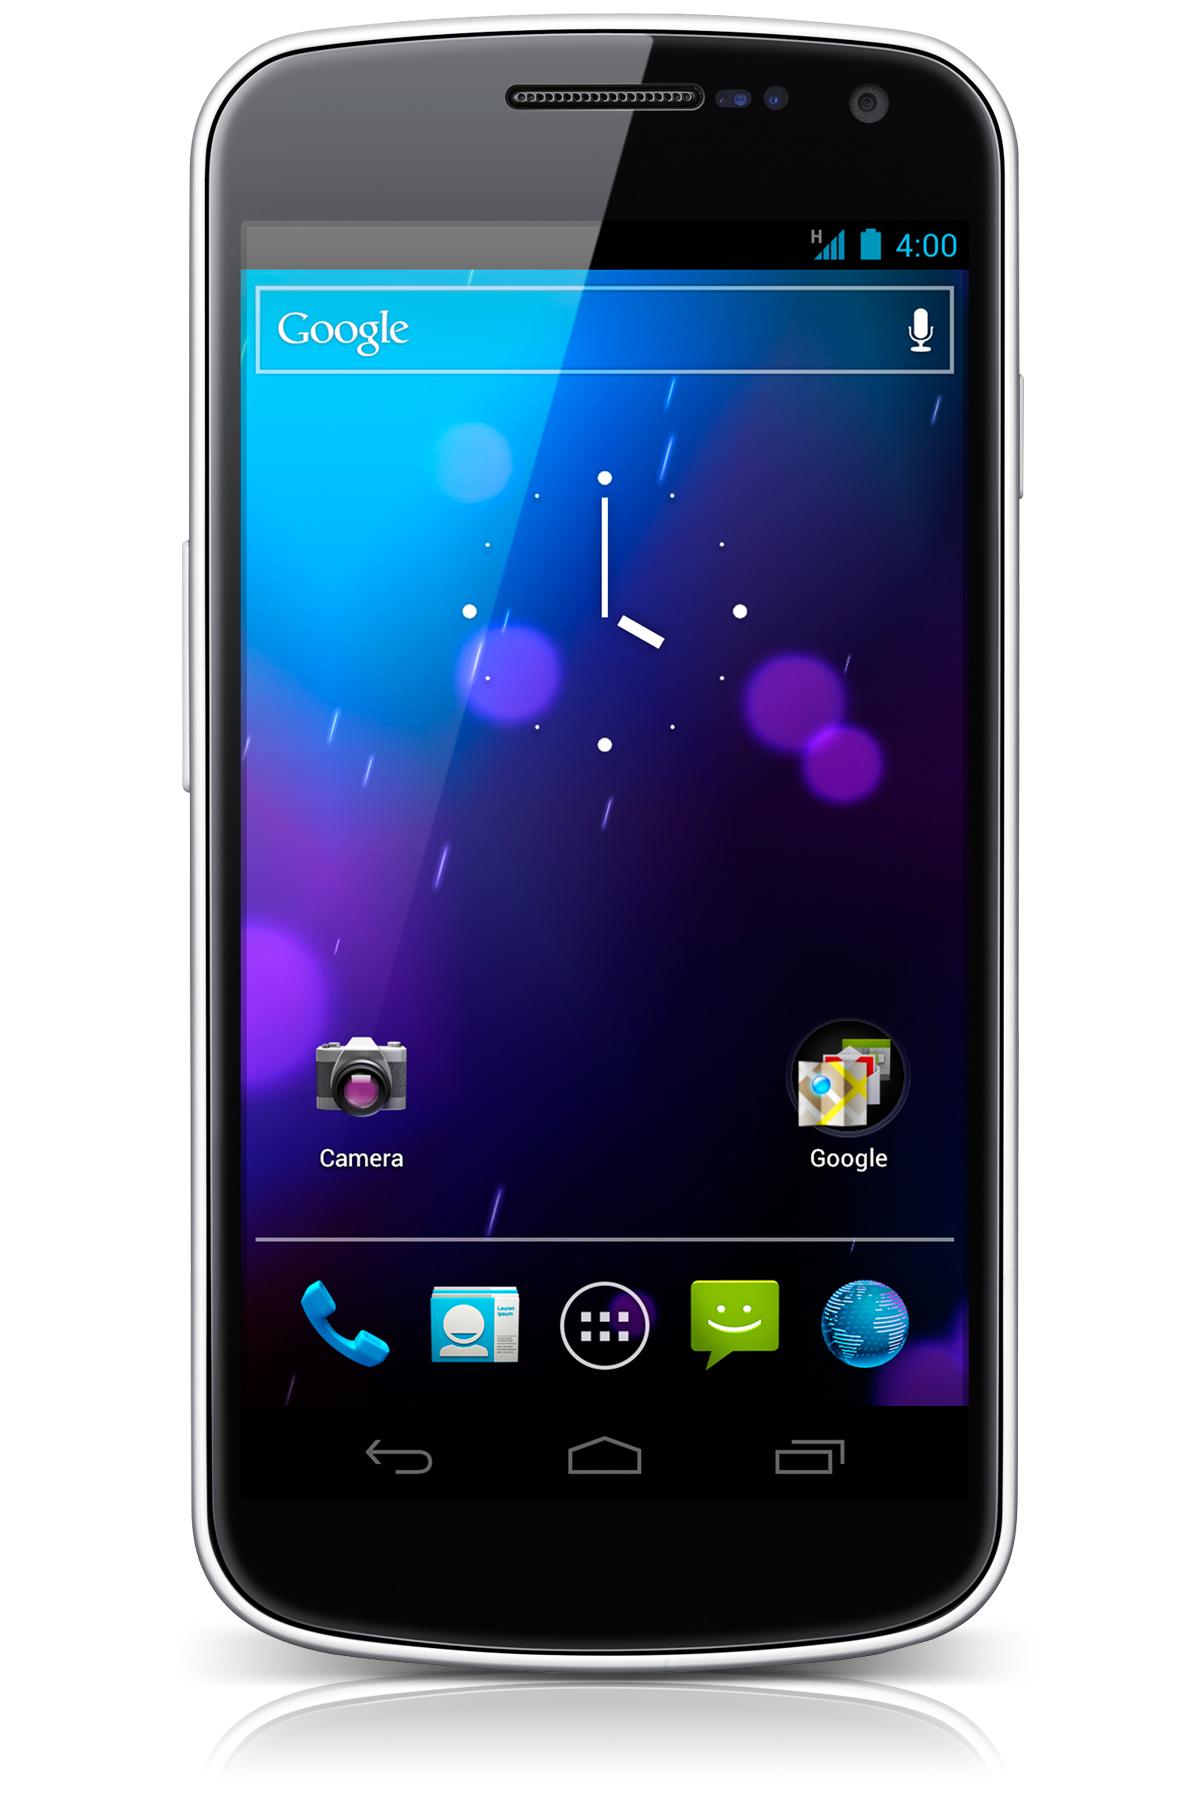 Top 5 Best Samsung Phones Ever Made